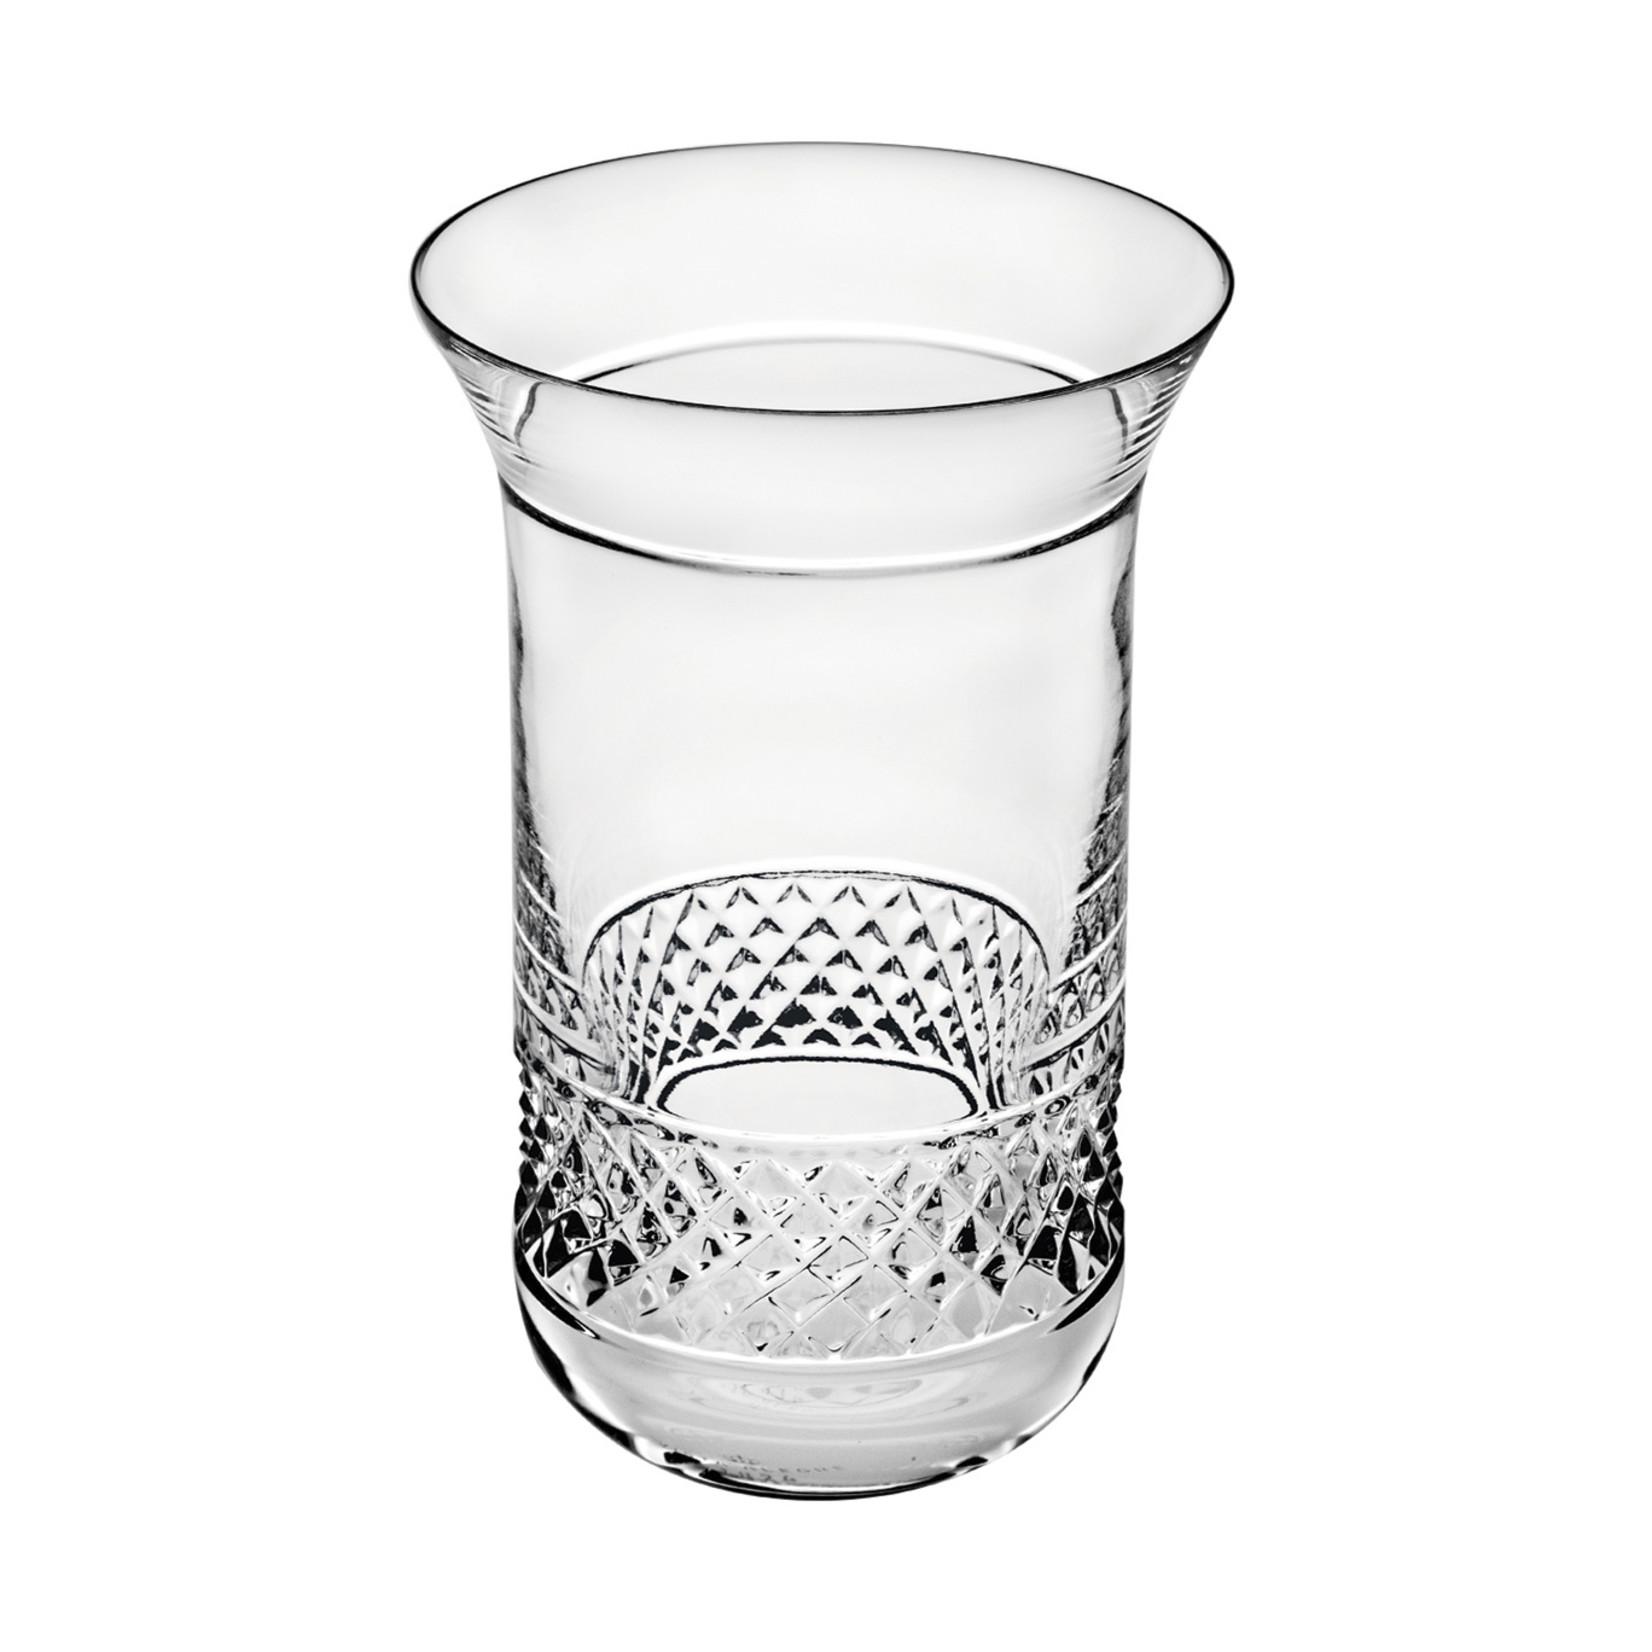 Vista Allegre Orphic Glassware